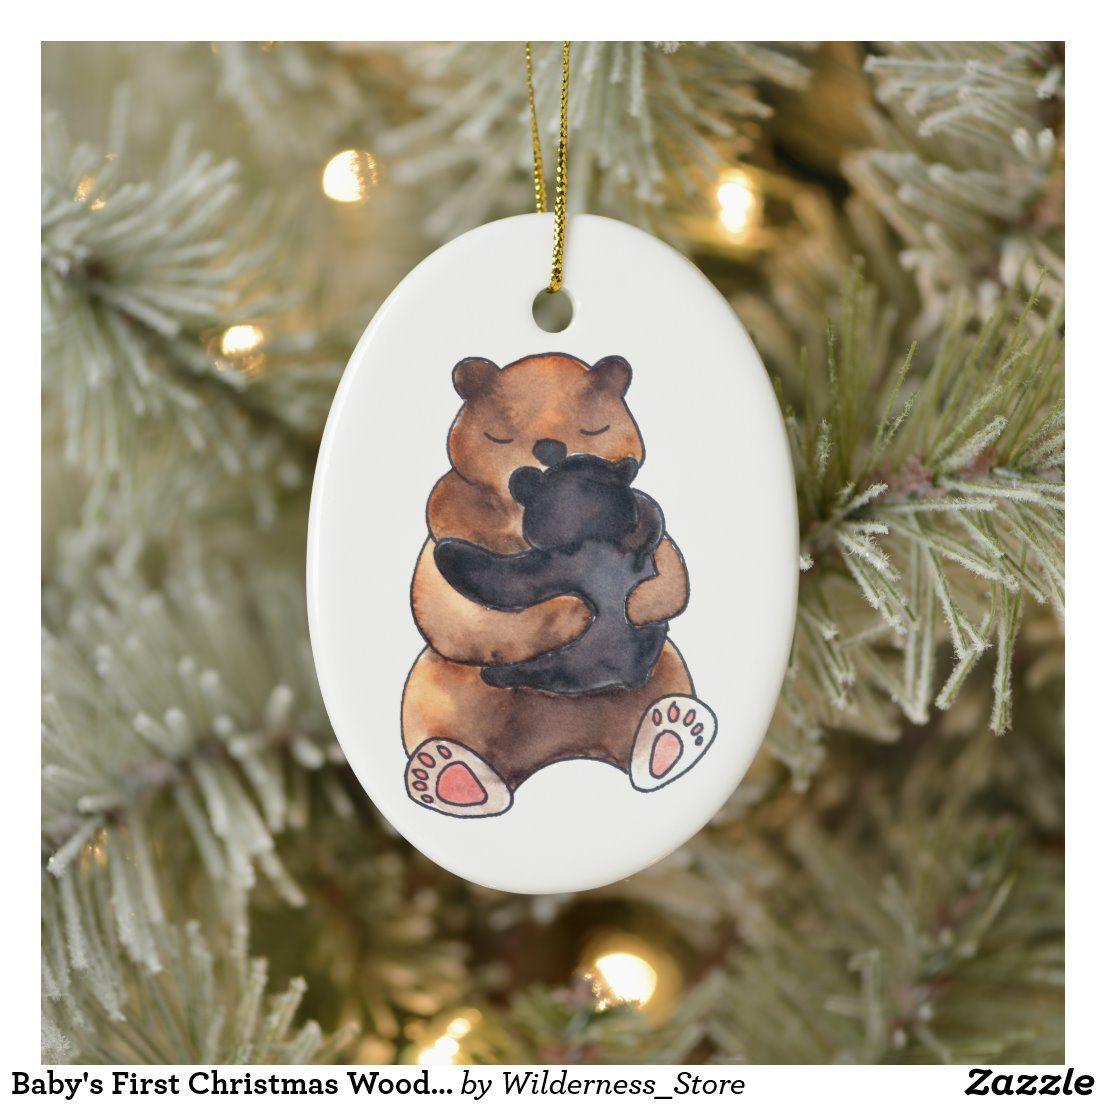 Cubs 2020 Christmas Ornament Baby's First Christmas Woodland Bear Hug Ceramic Ornament | Zazzle